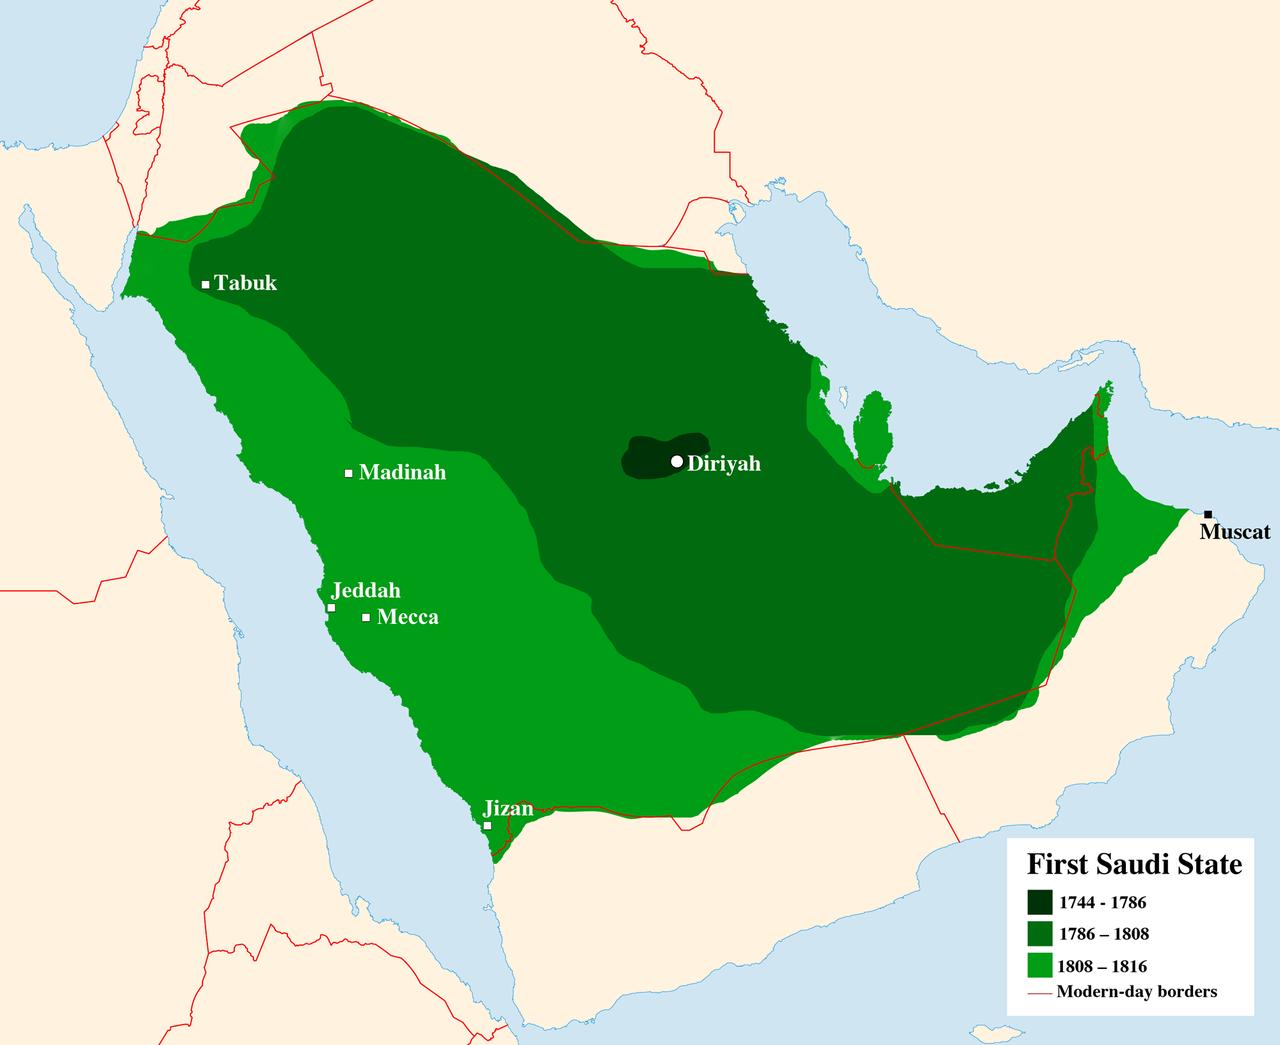 1280px-first_saudi_state_big.png